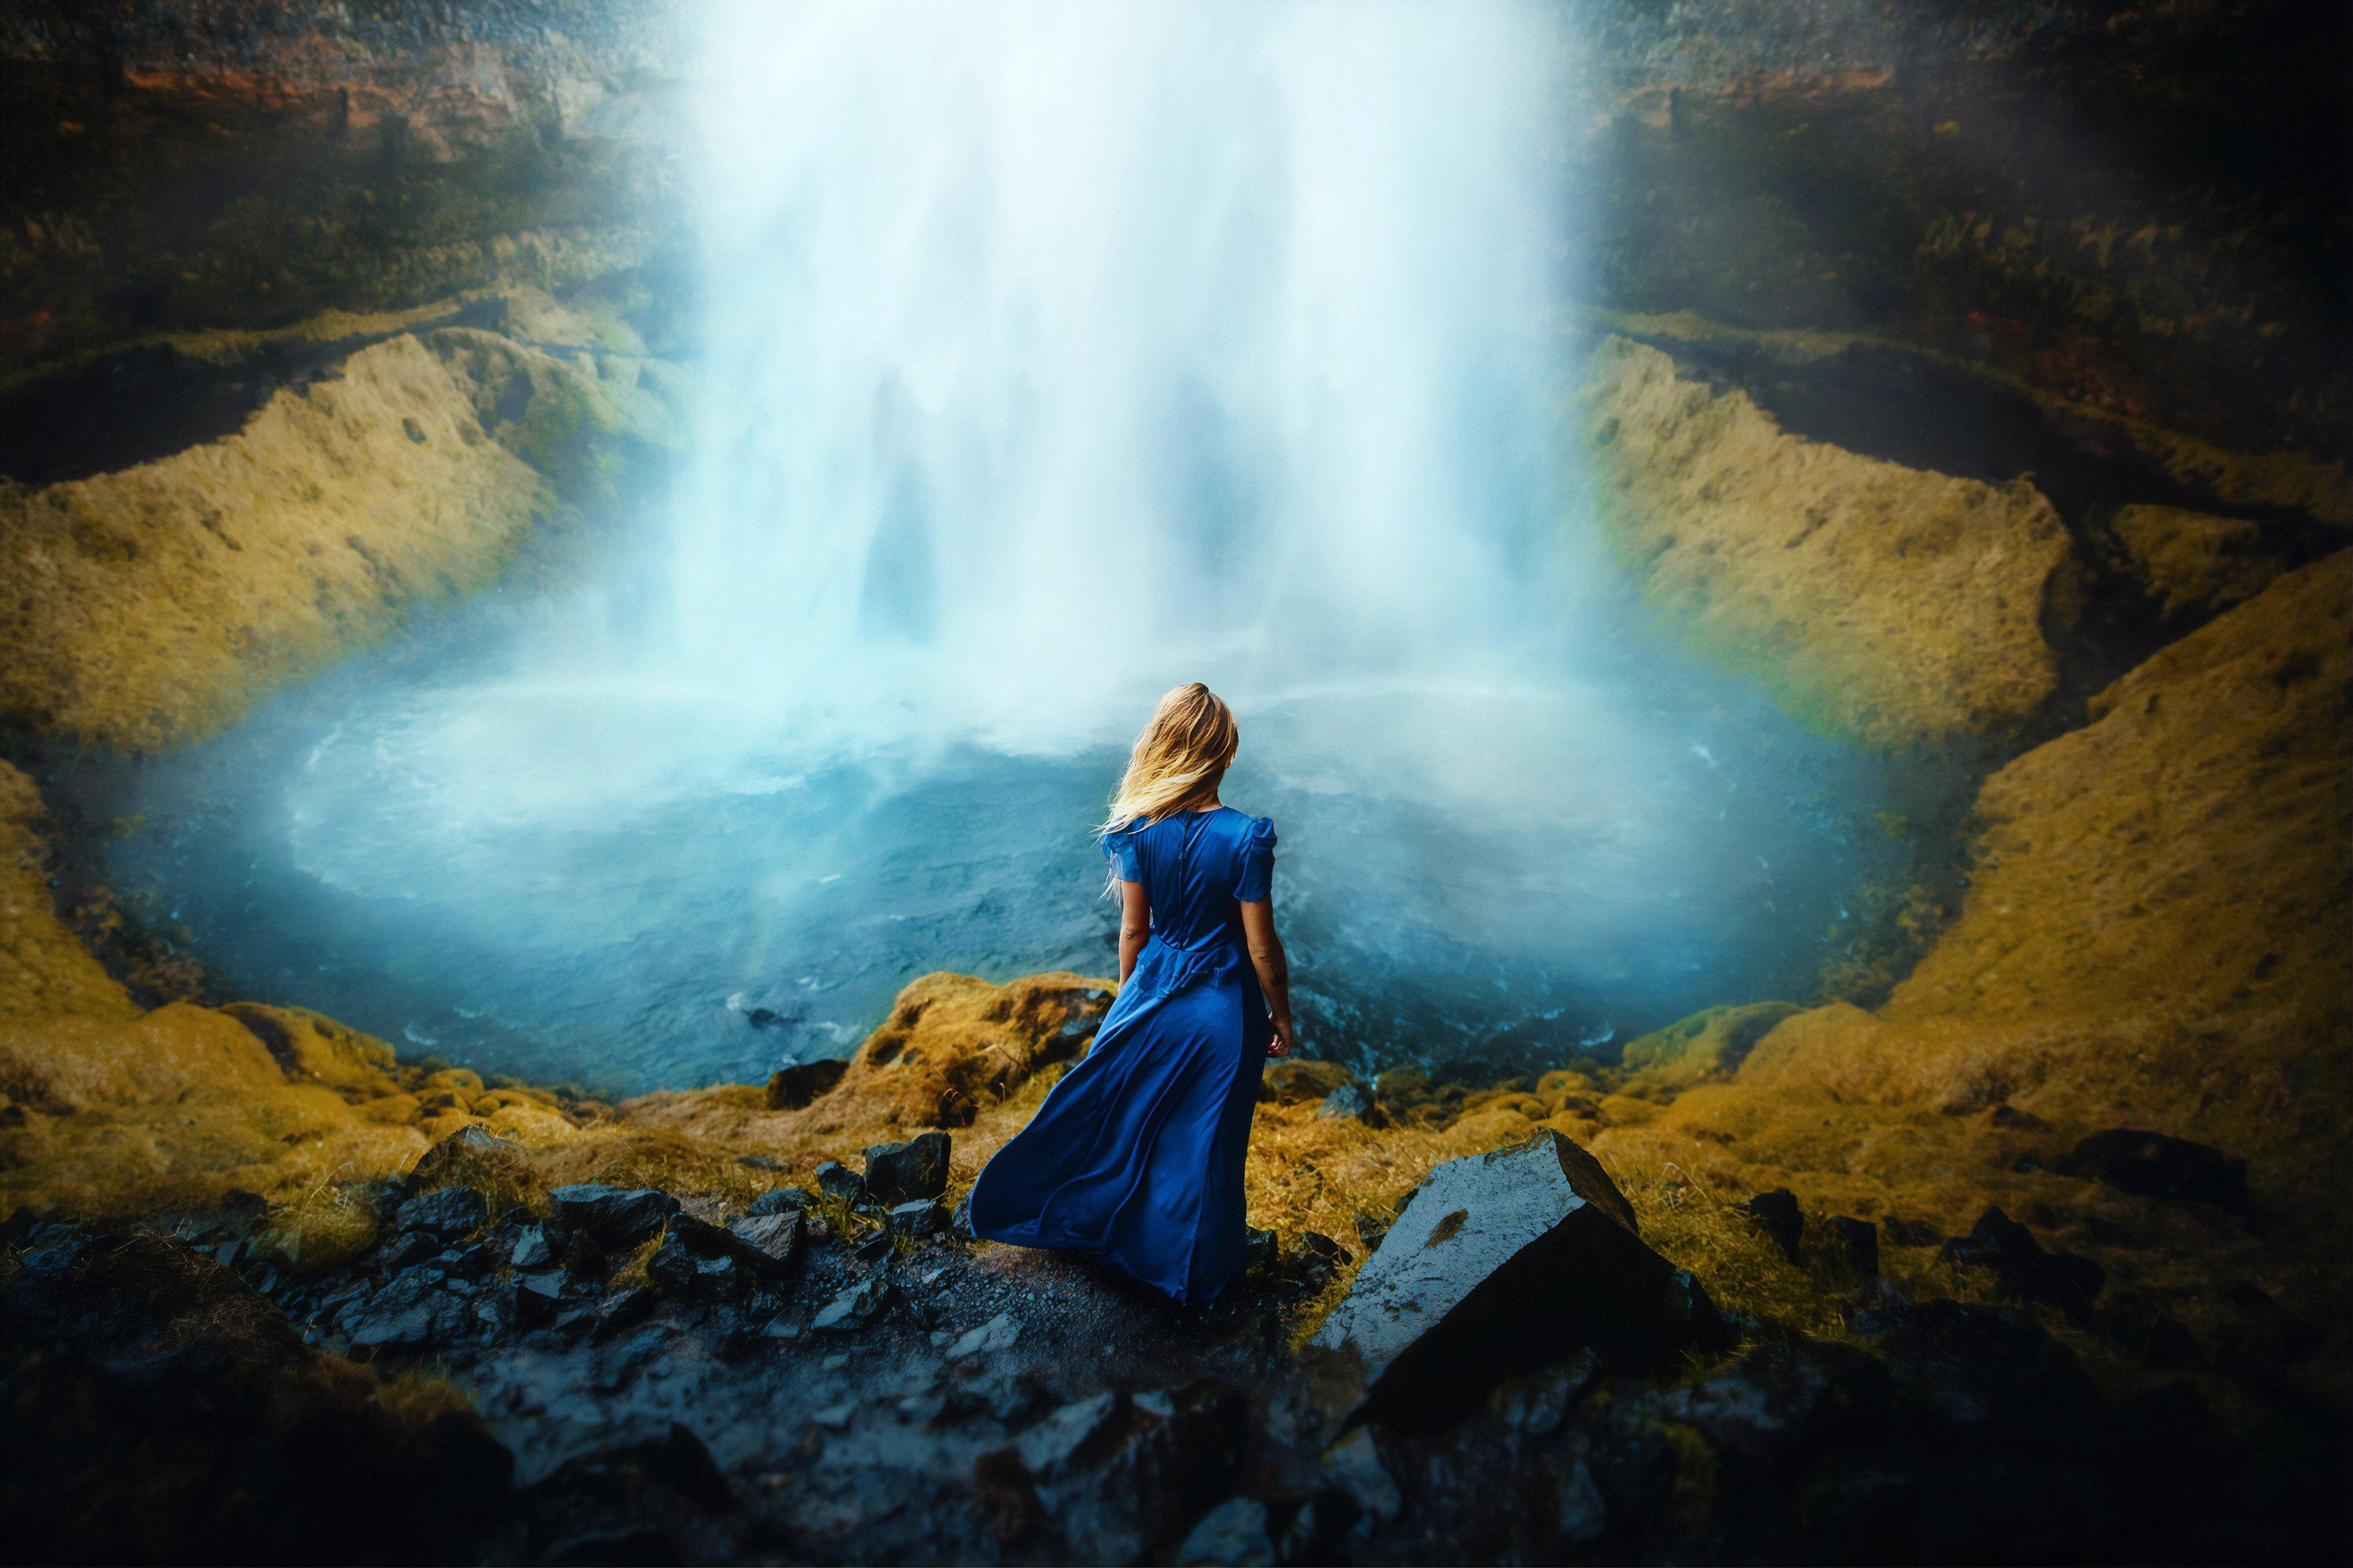 Wallpaper Woman in a dress in front of waterfall